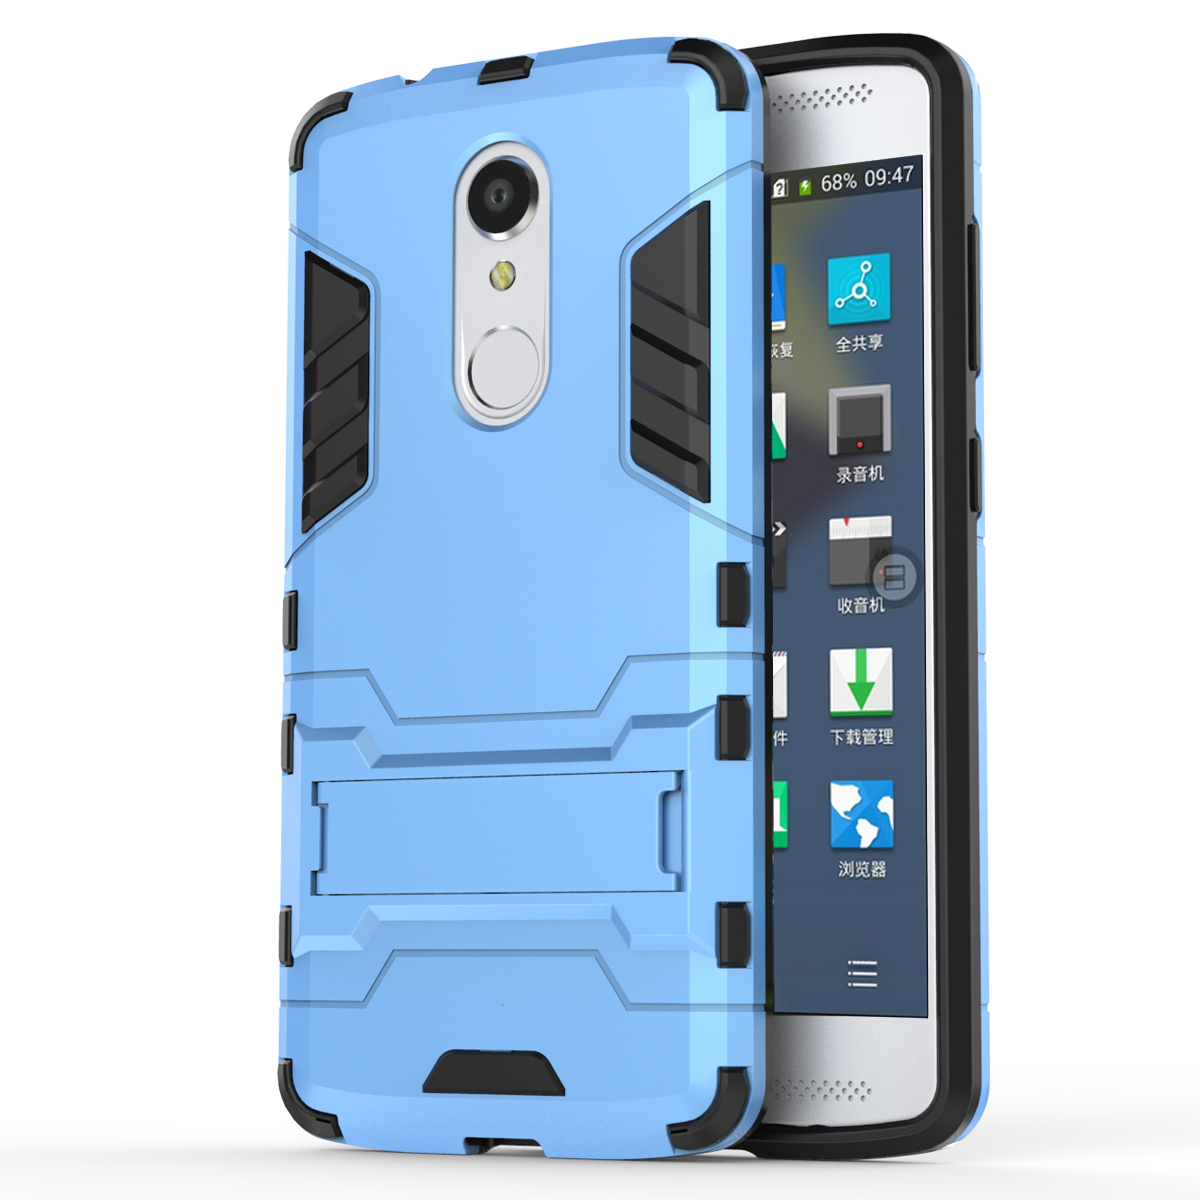 Slim Armor Kickstand Tough Protective Cover Case For ZTE AXON 7 Mini 5 2  inch - Blue from citb